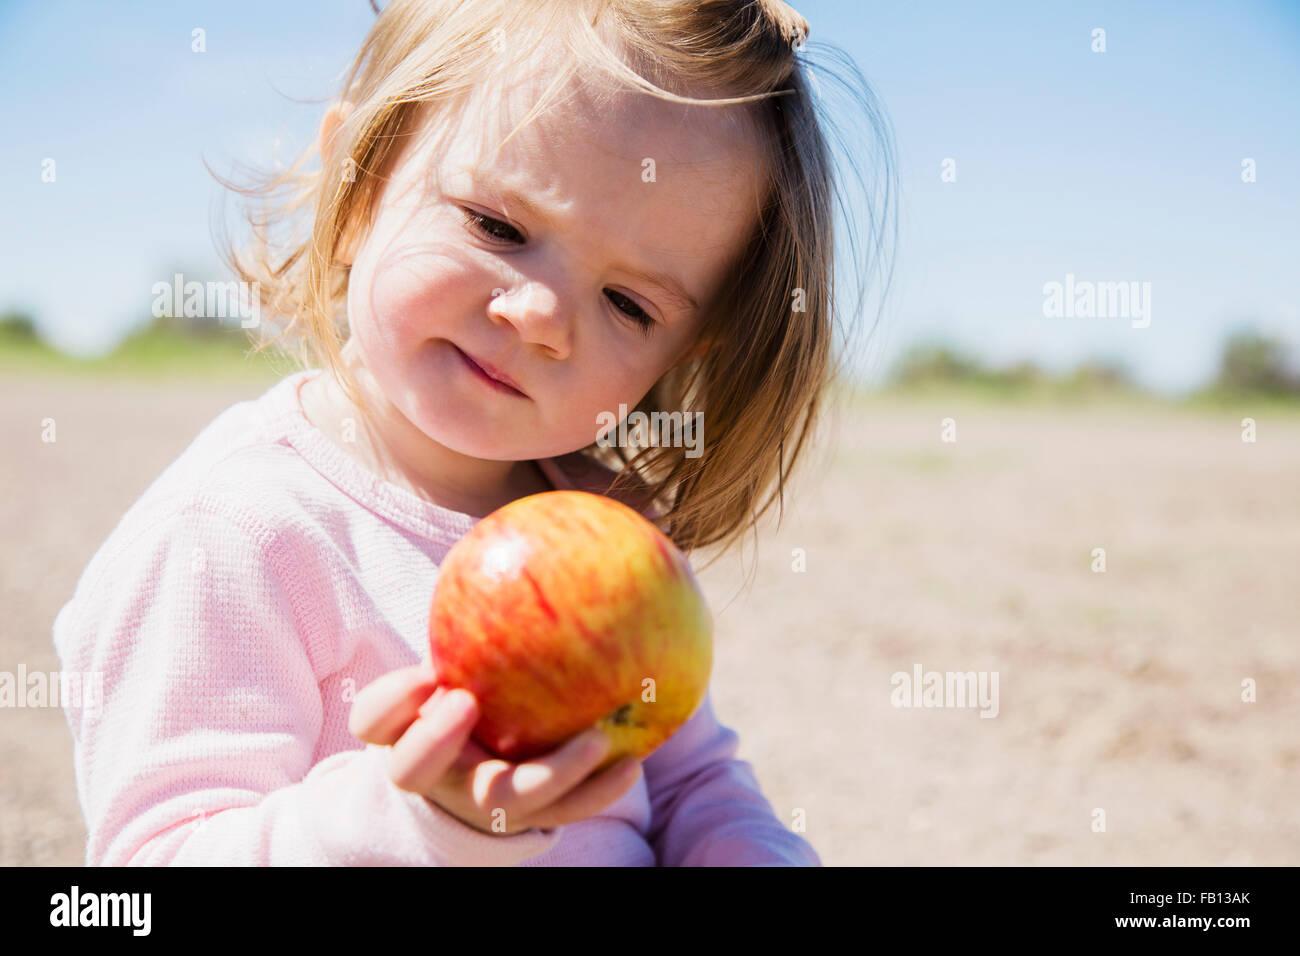 Porträt von Mädchen (2-3) Holding apple Stockbild